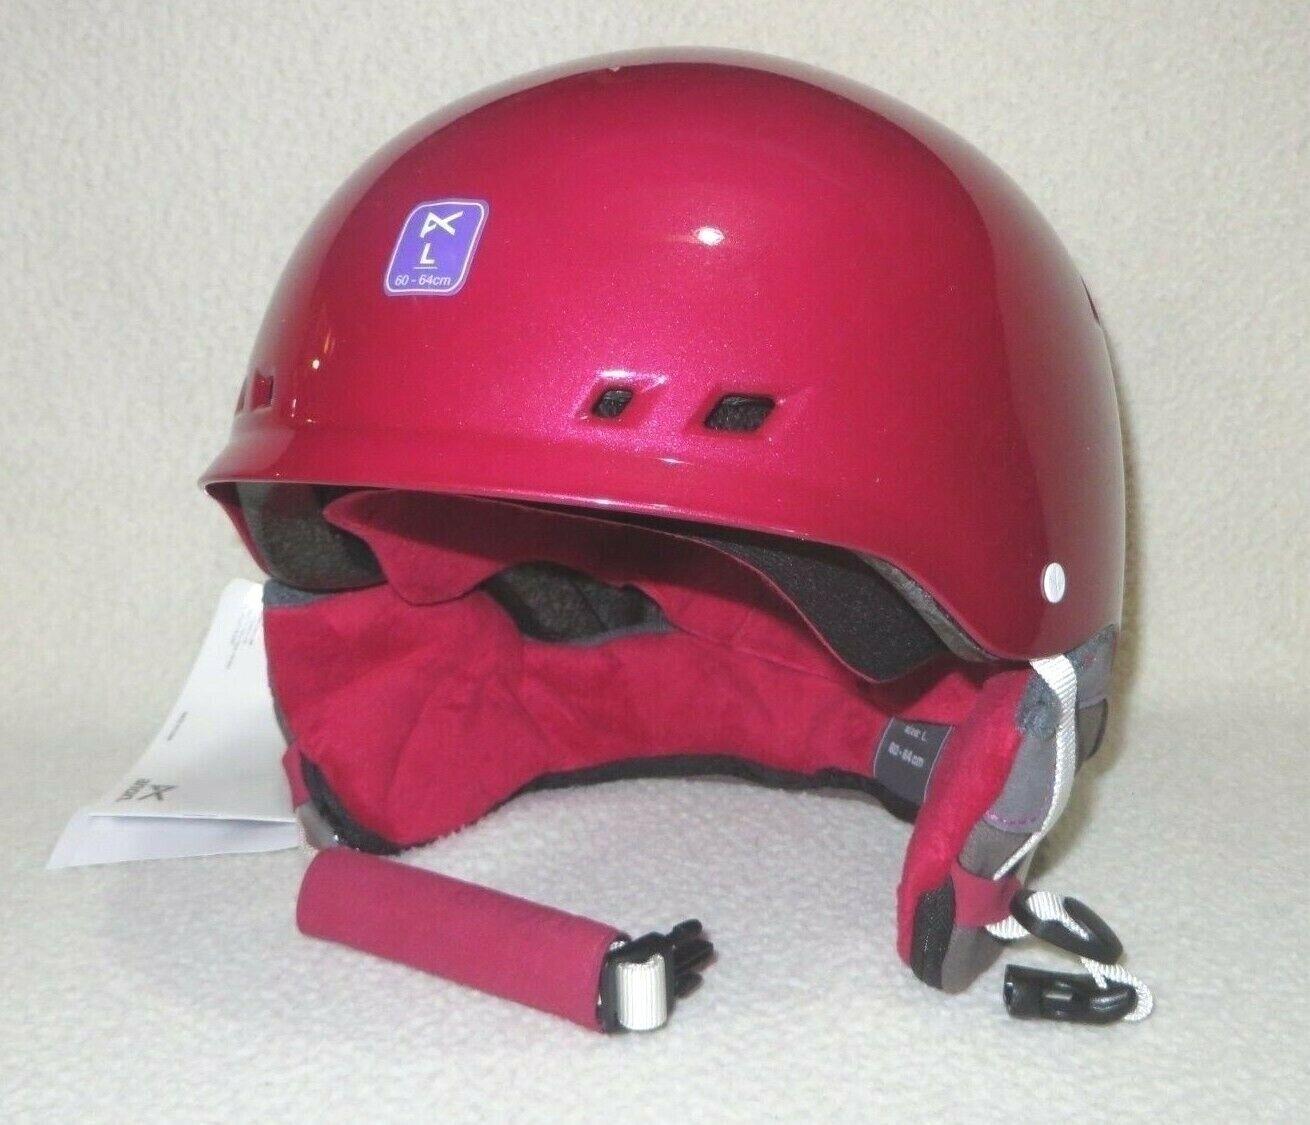 New Anon  By Burton Womens Wren Ski Snowboard Helmet Large 60-64 CM  promotional items